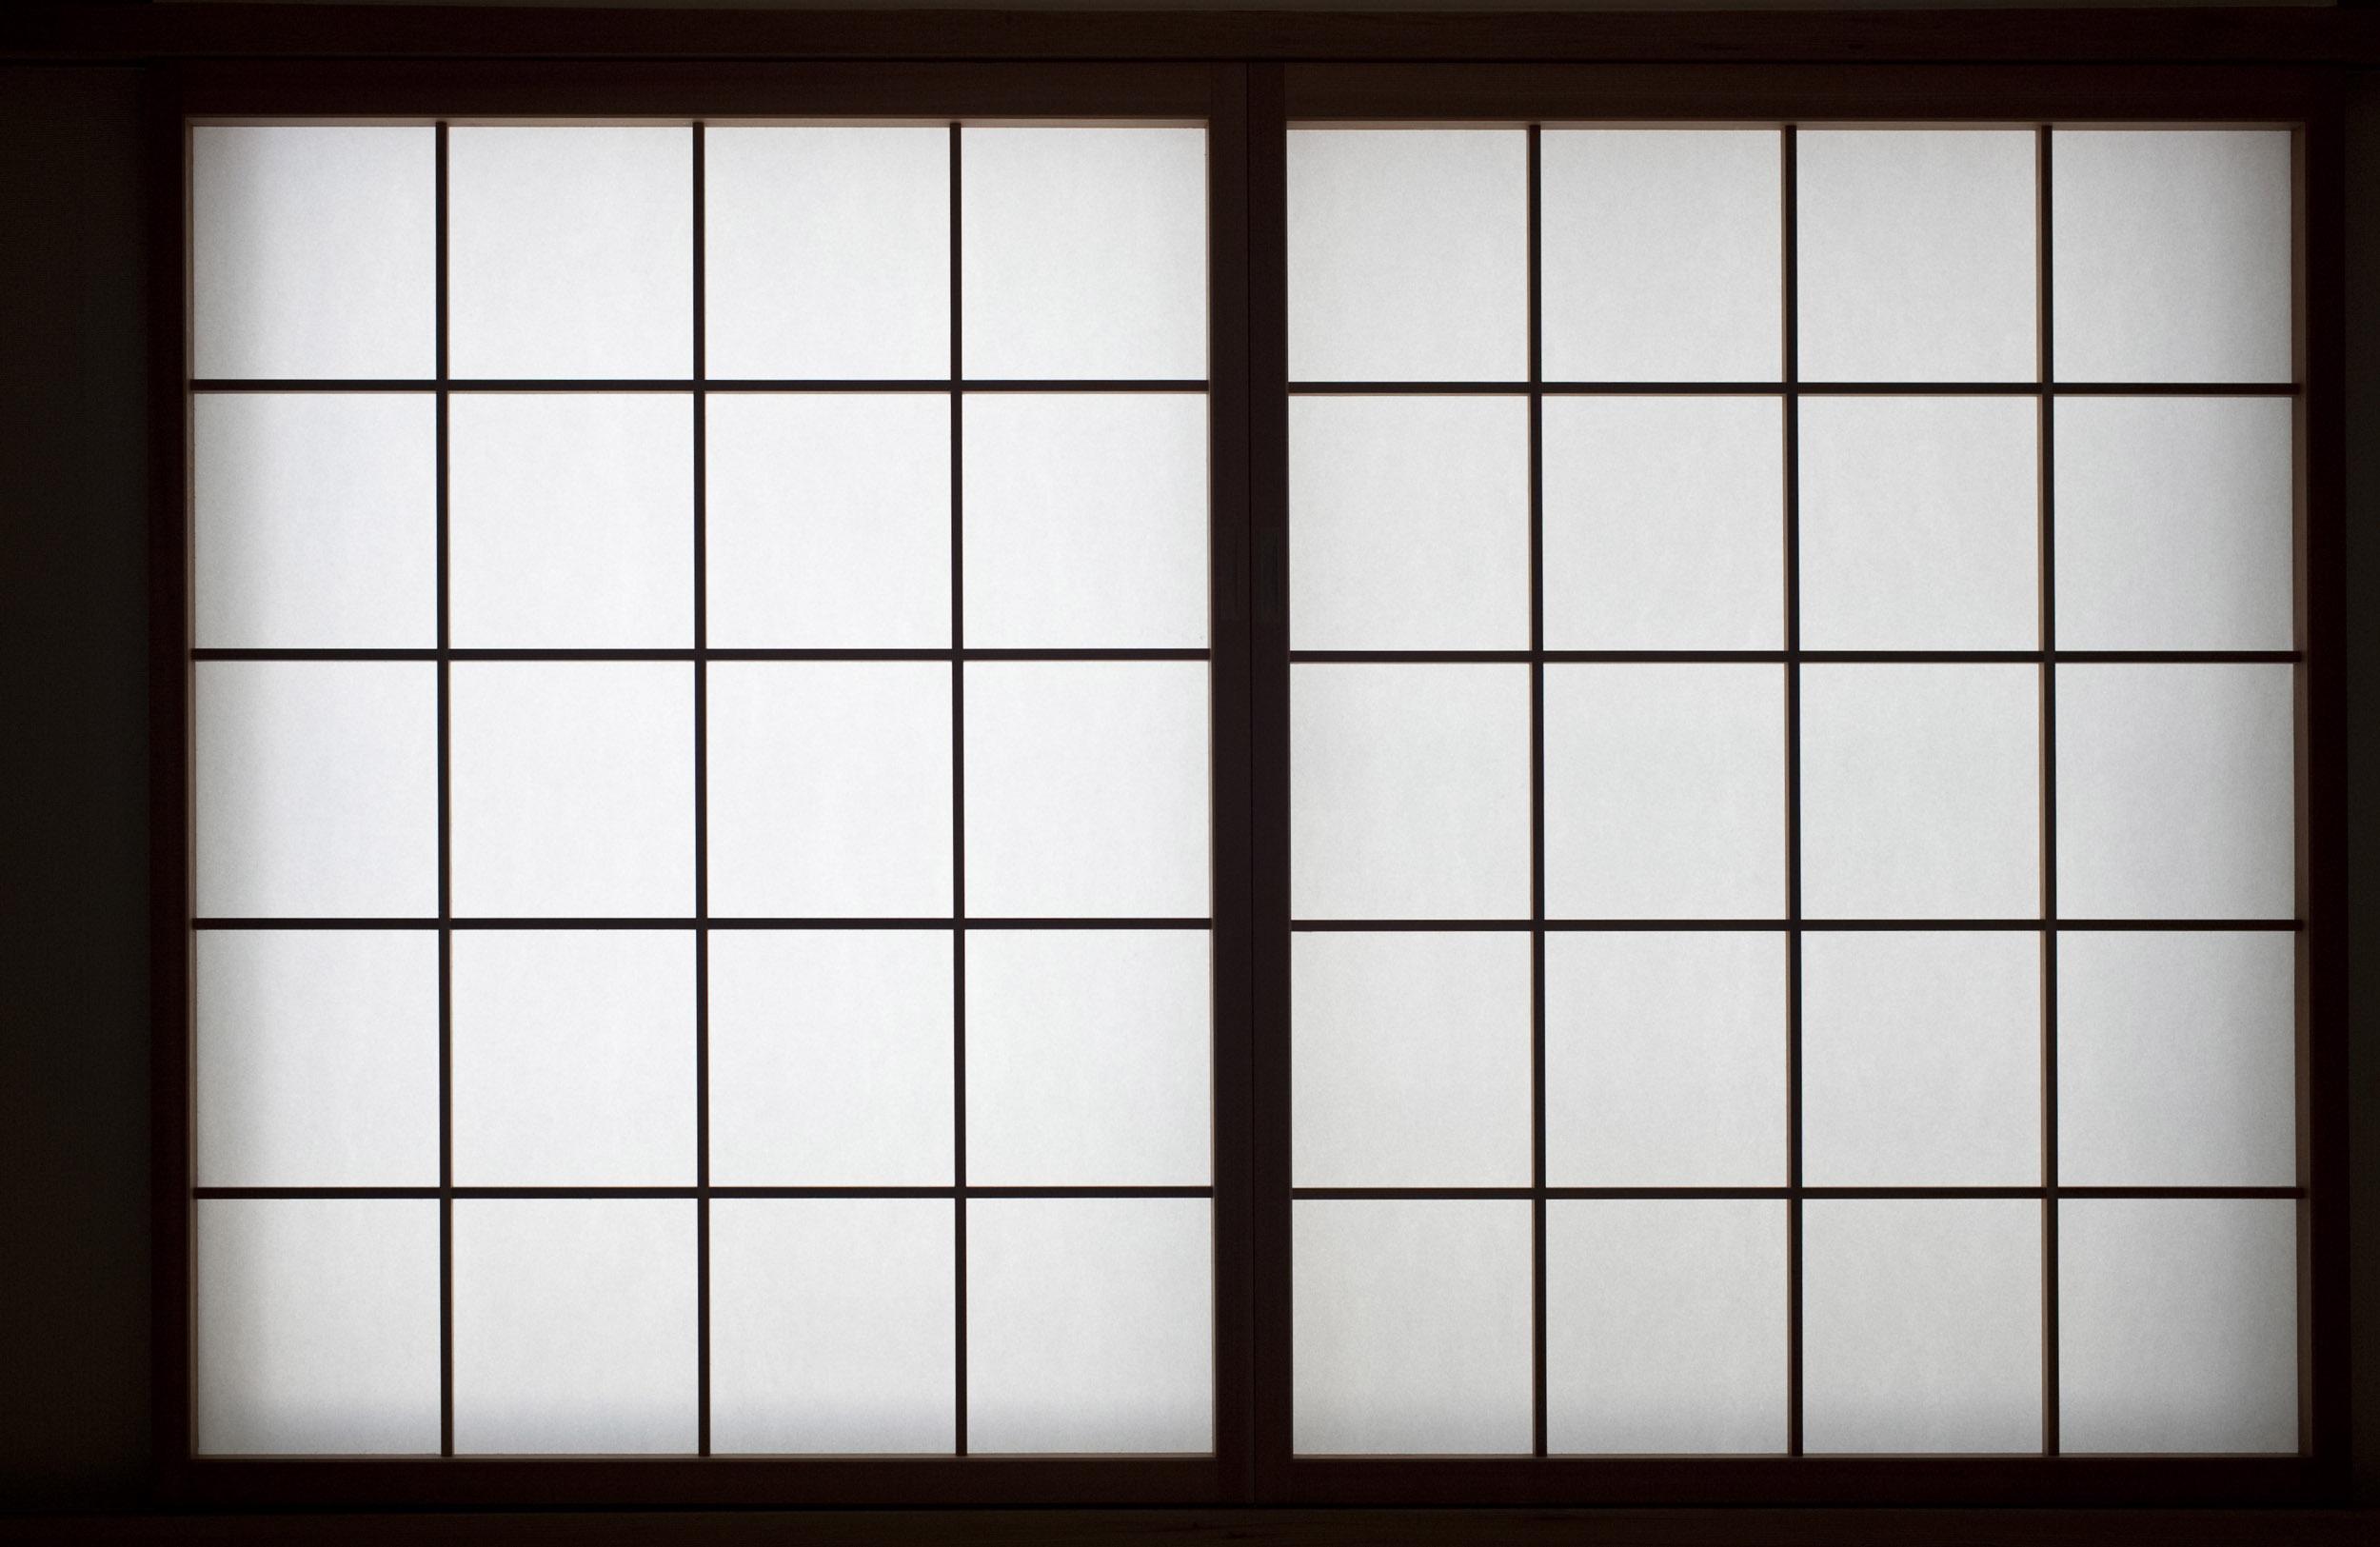 Traditional japanese home interior - Paper Windows Desktop Wallpaper Iskin Co Uk